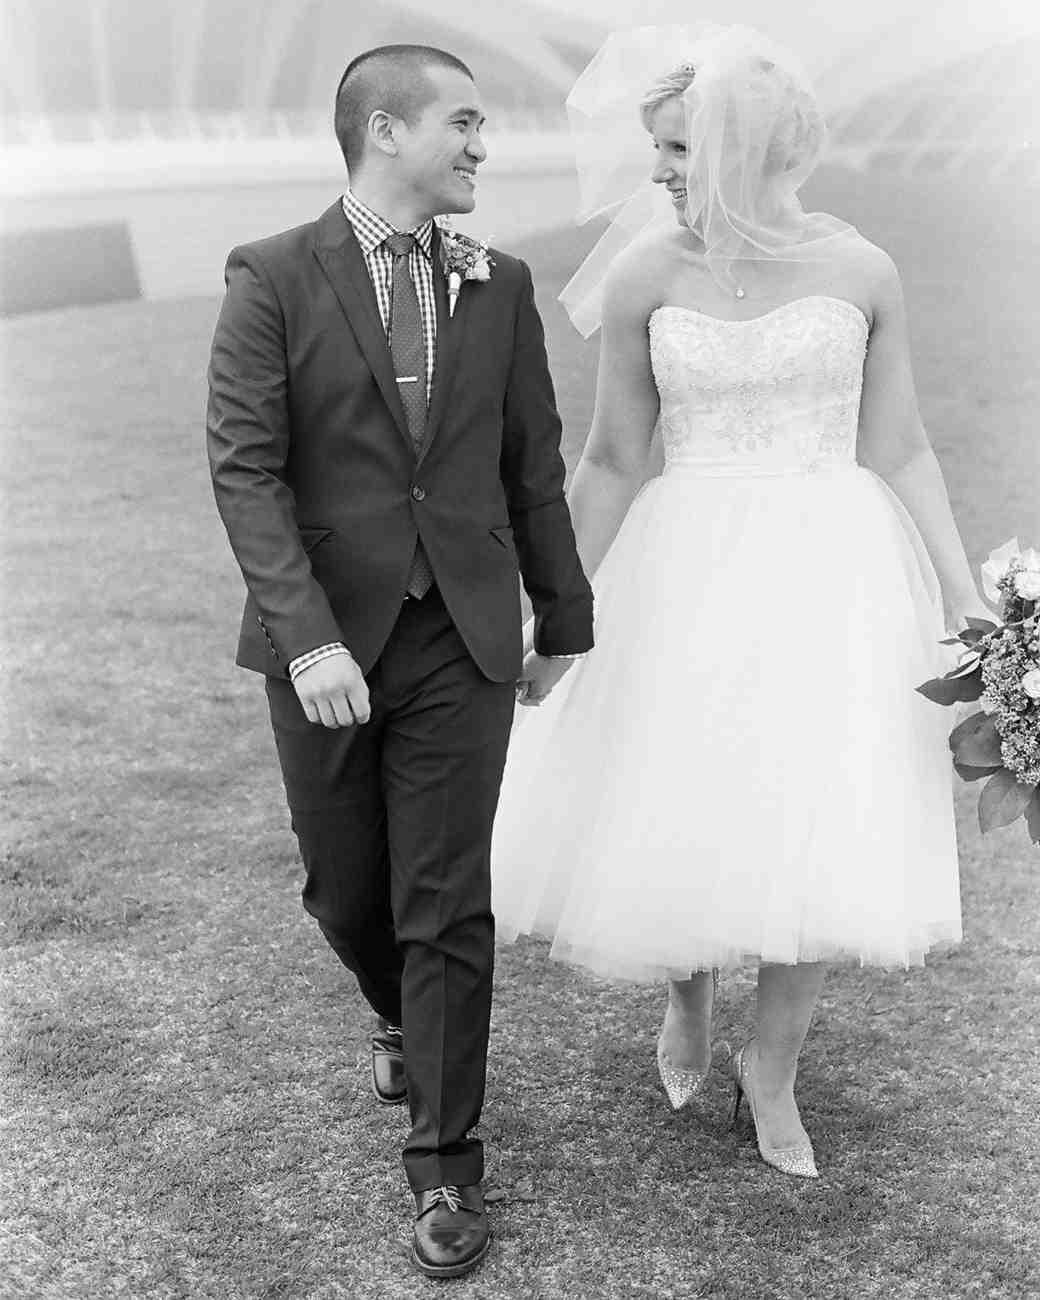 libby-allen-wedding-couple-065-s112487-0116.jpg